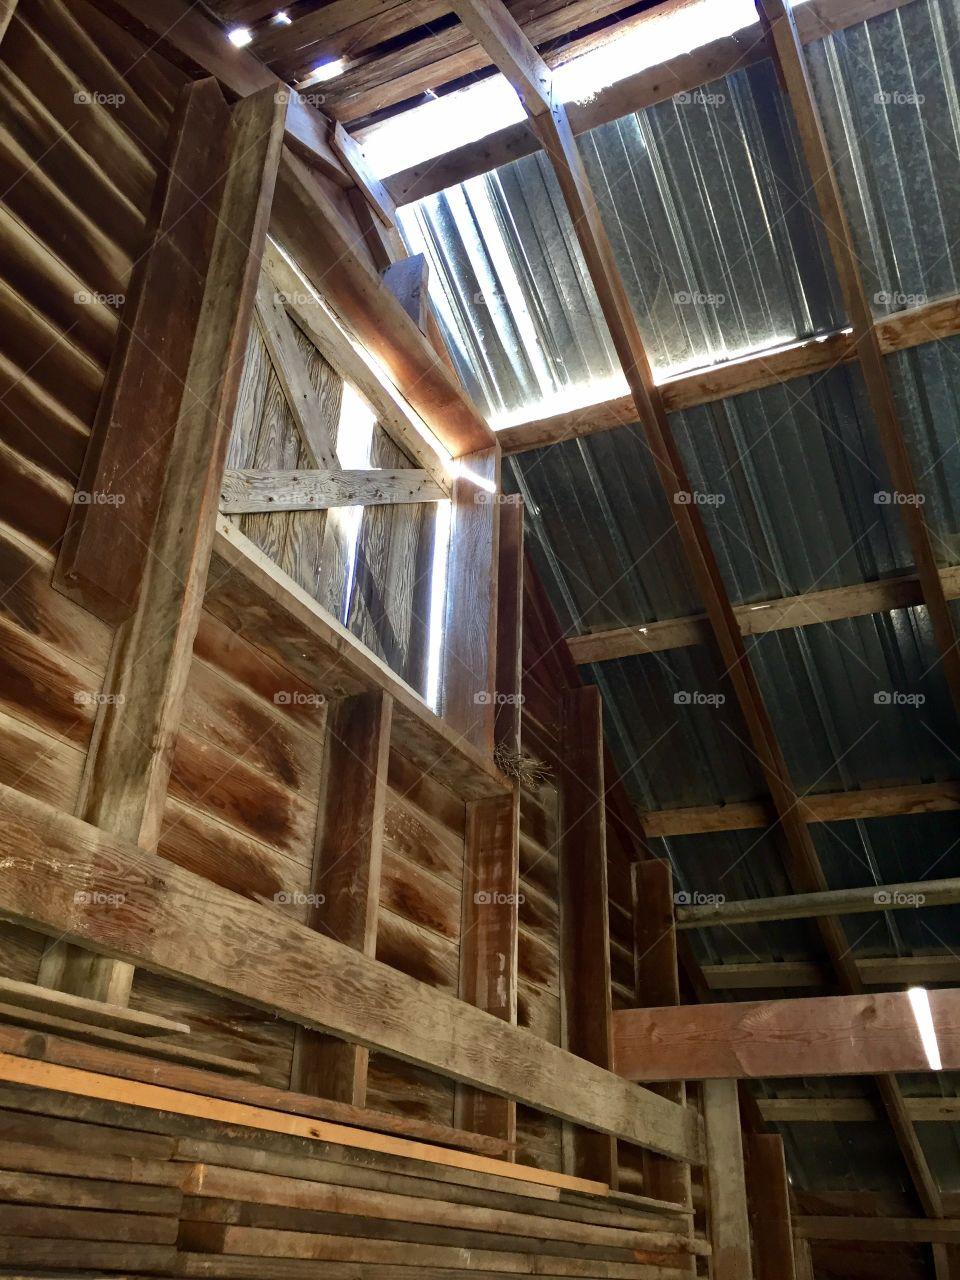 Shed Loft Door - Interior